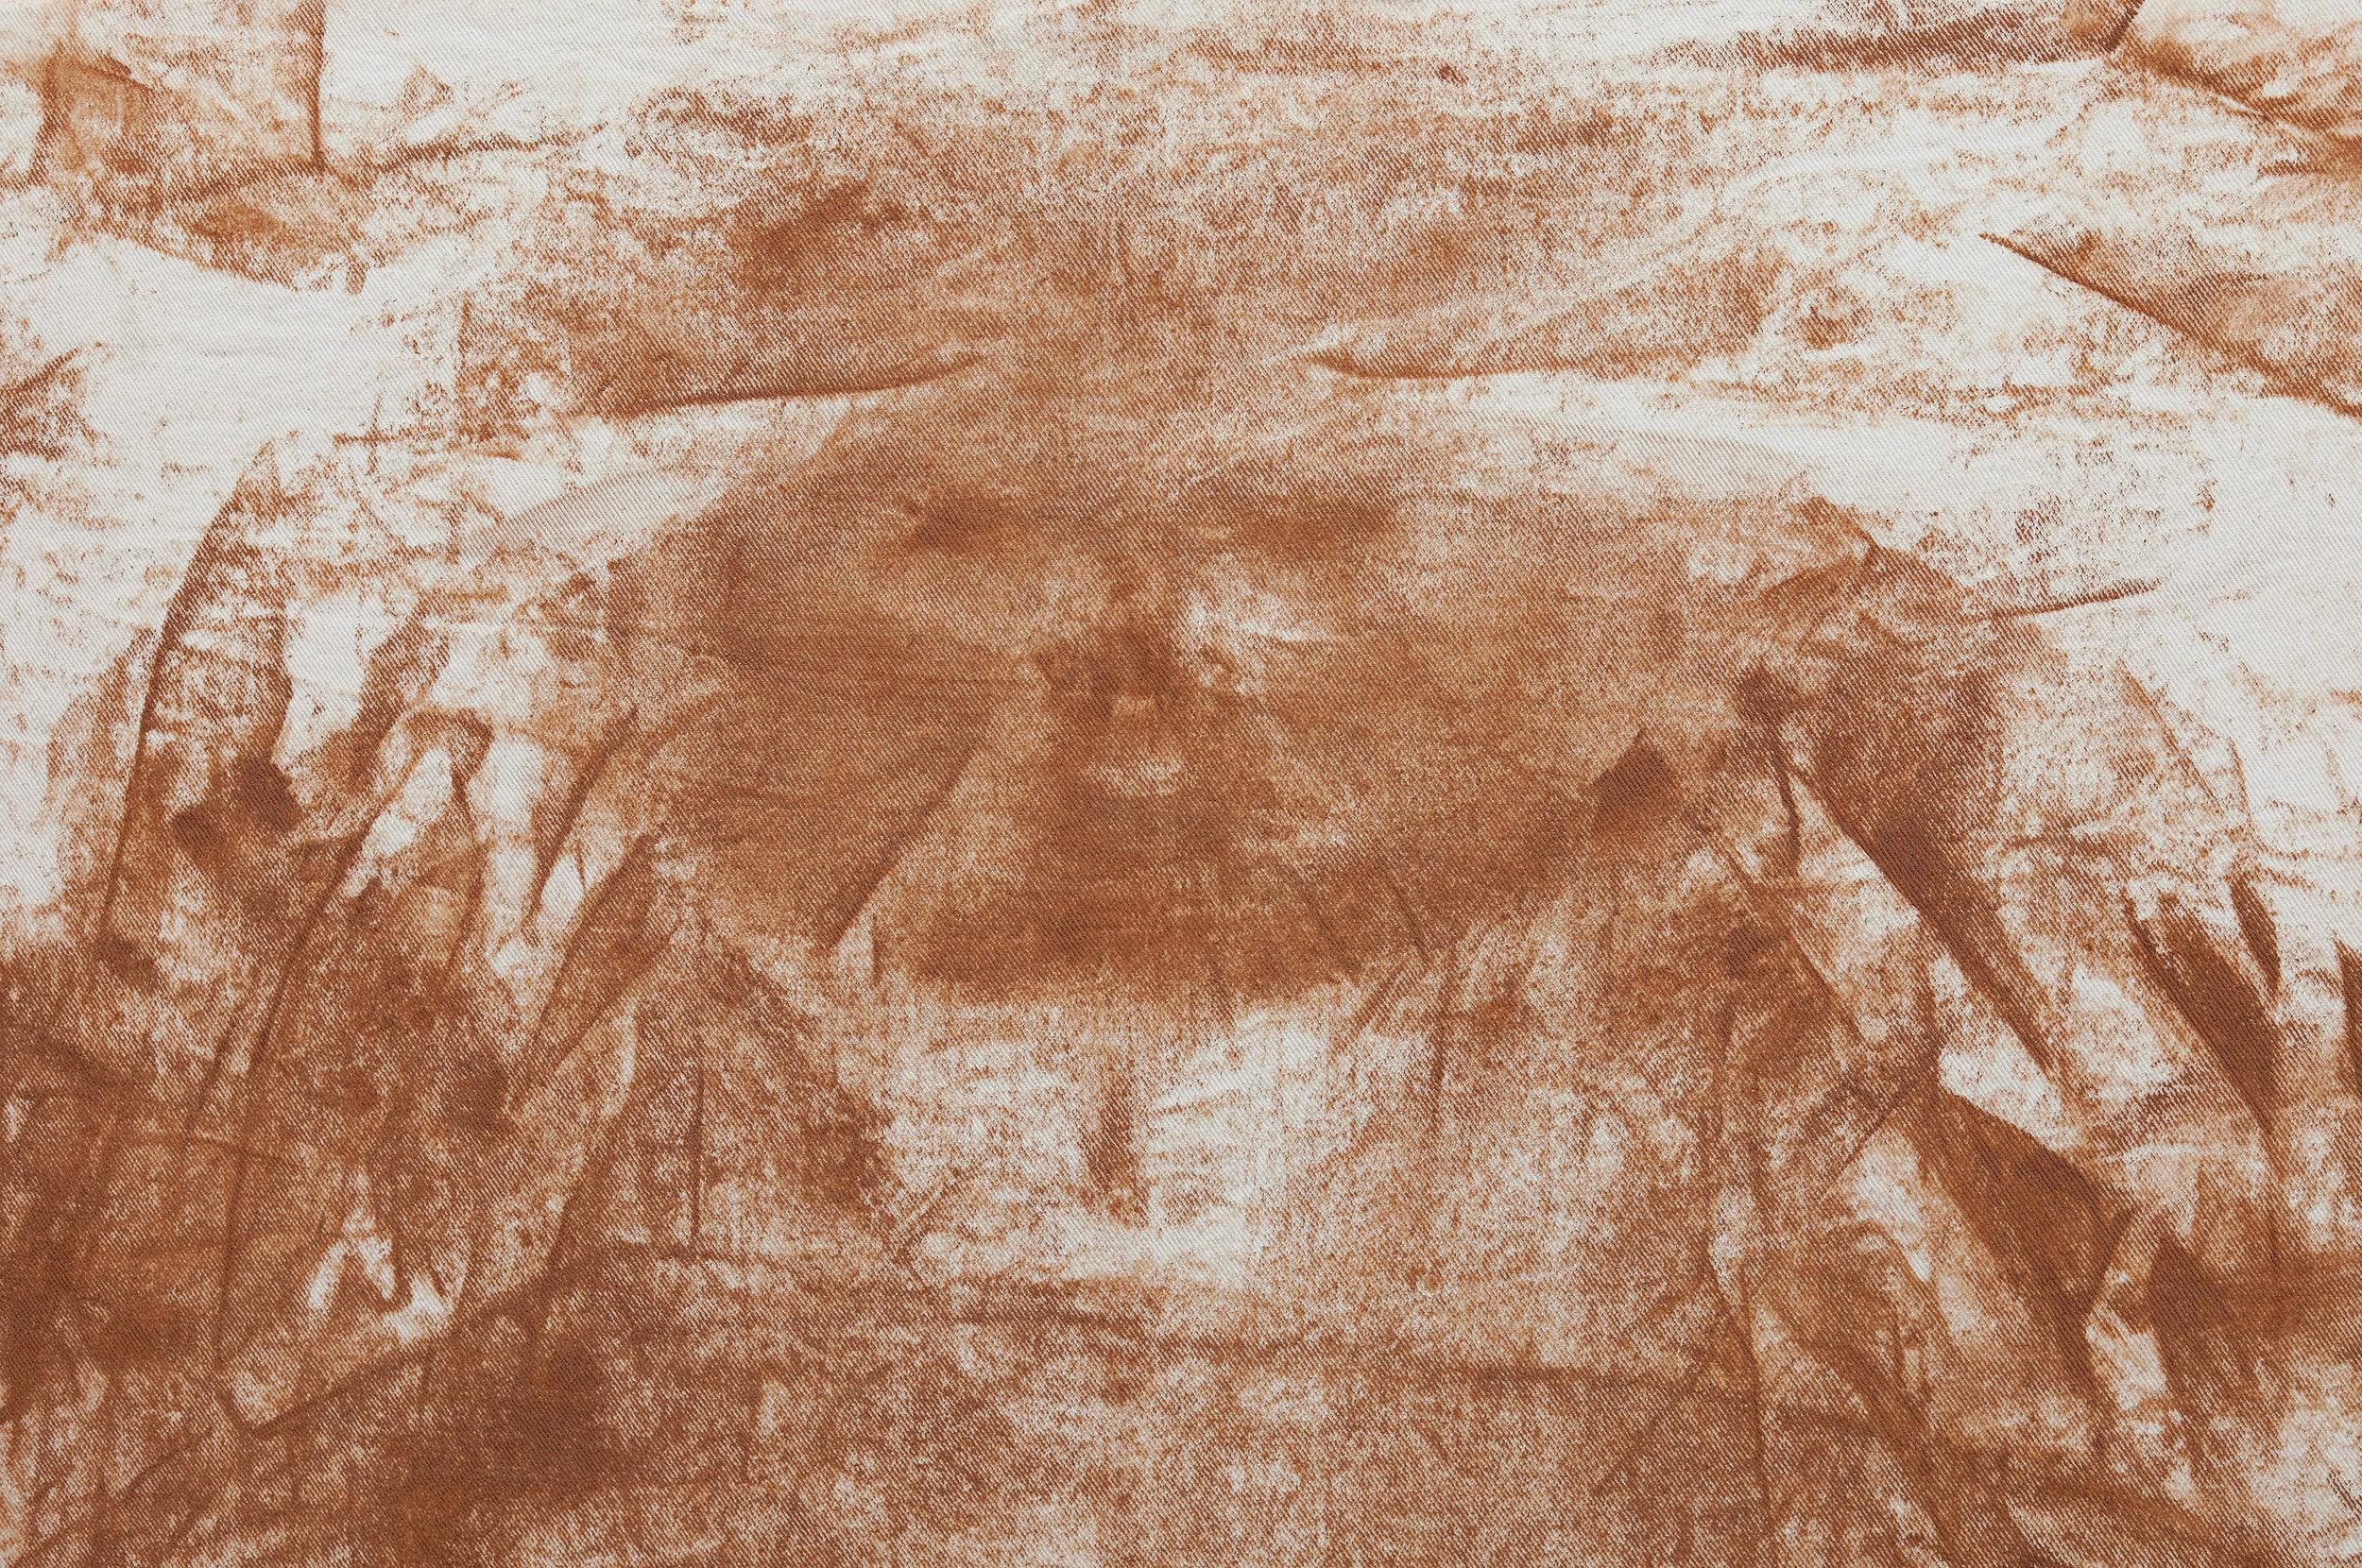 Life Shroud (Izar III) detail